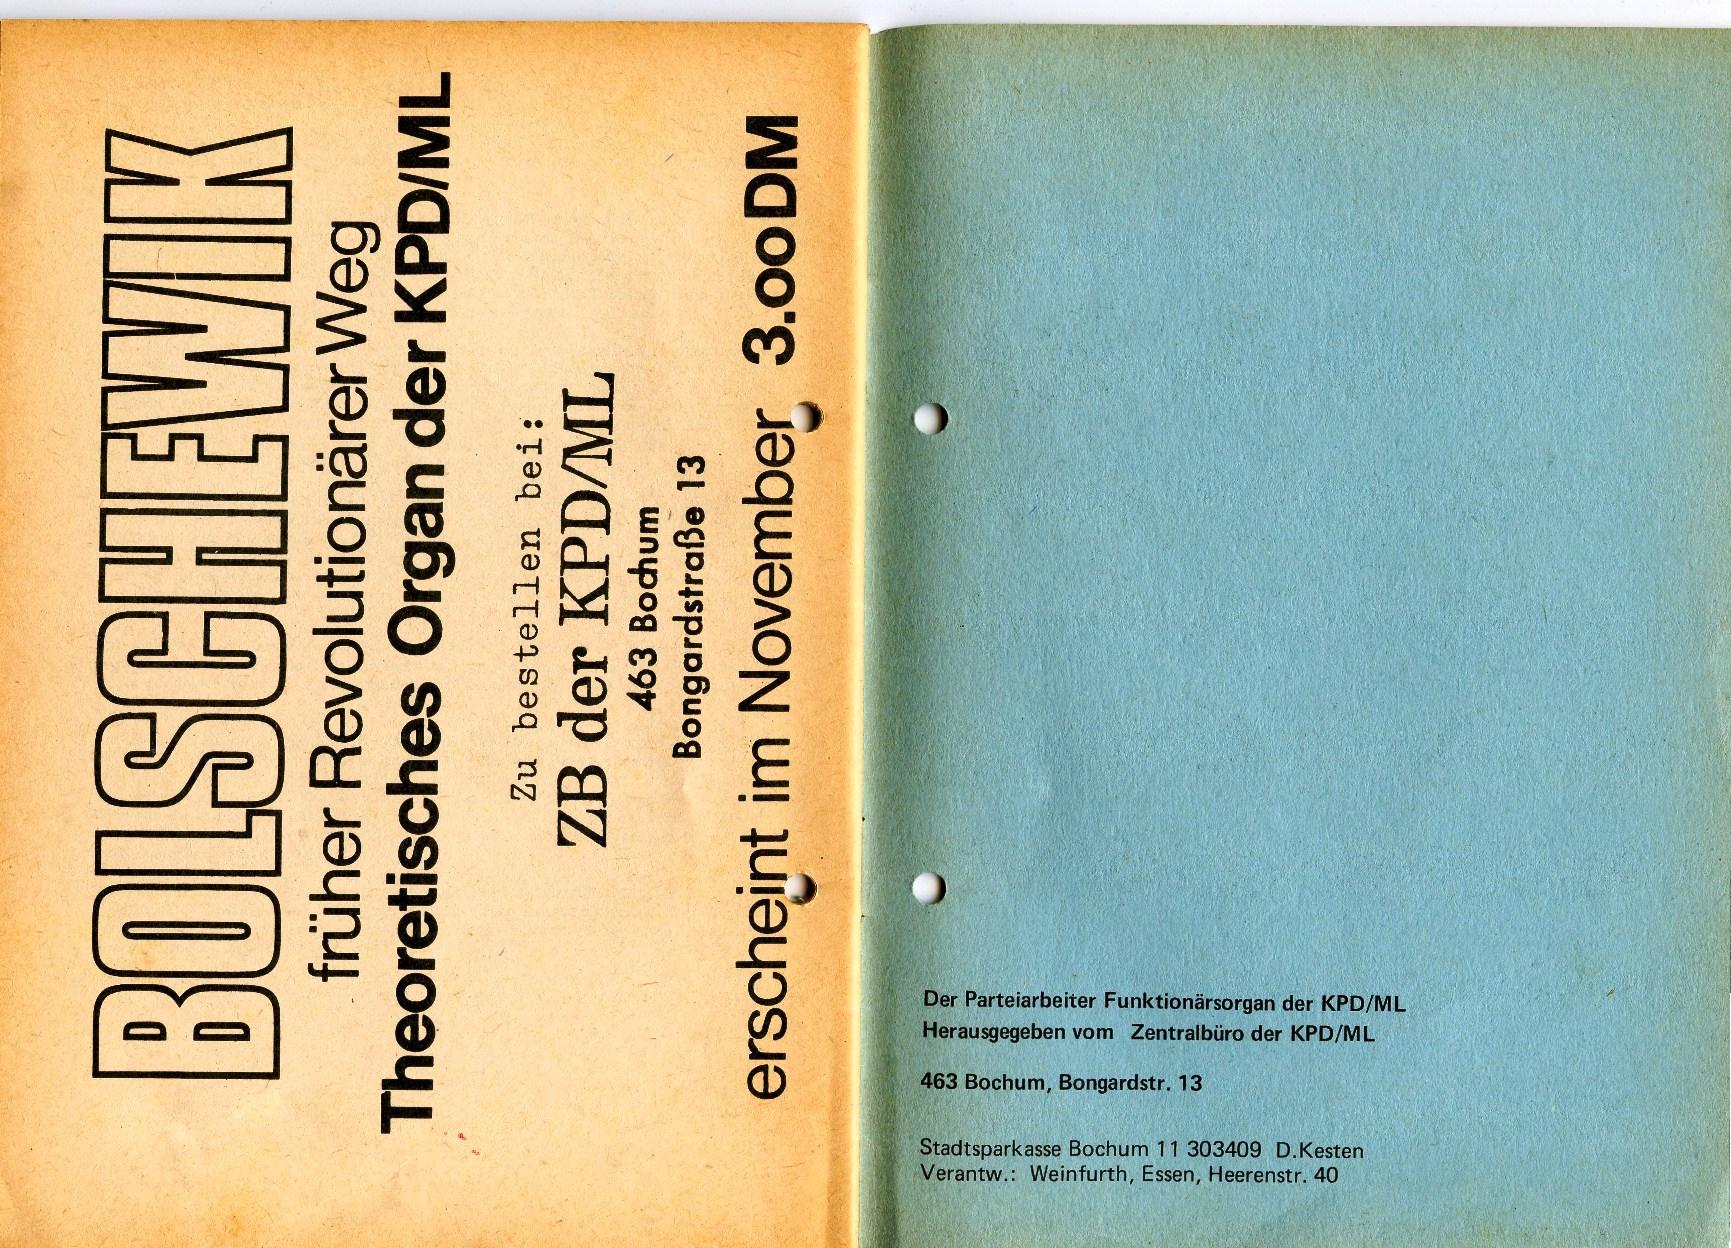 ZB_Parteiarbeiter_1970_02_27